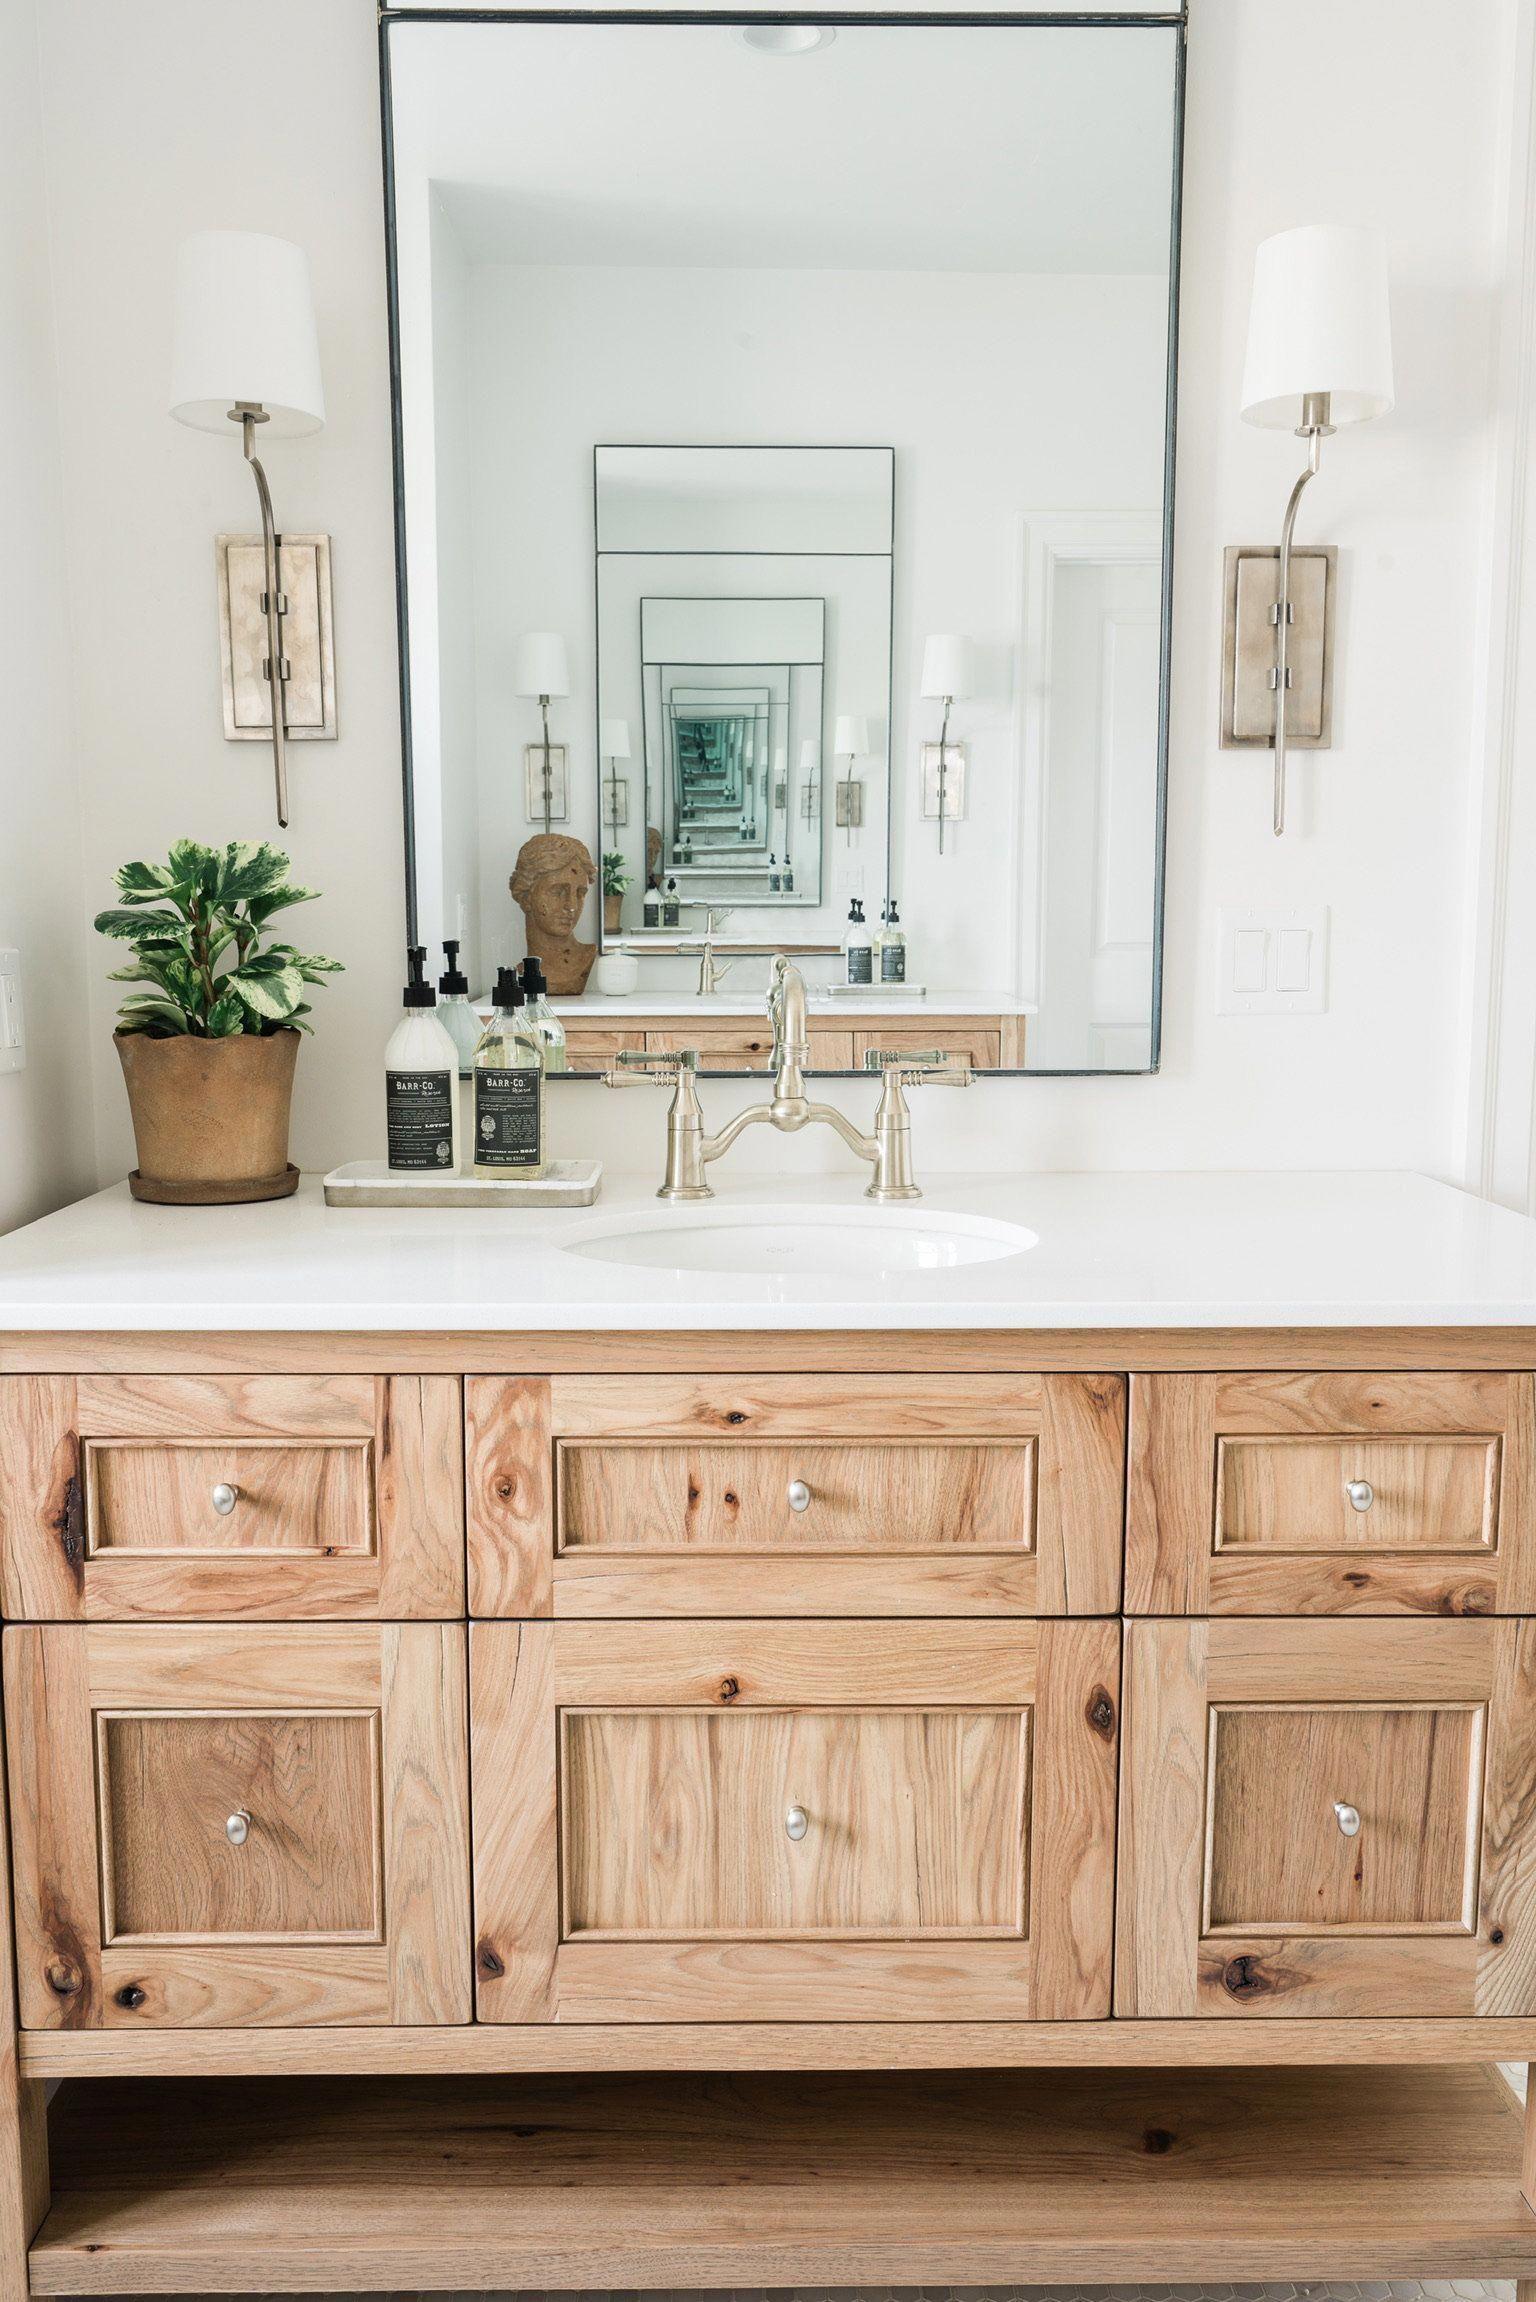 Large Modern Wall Mirror Bathroom Vanity Decorative